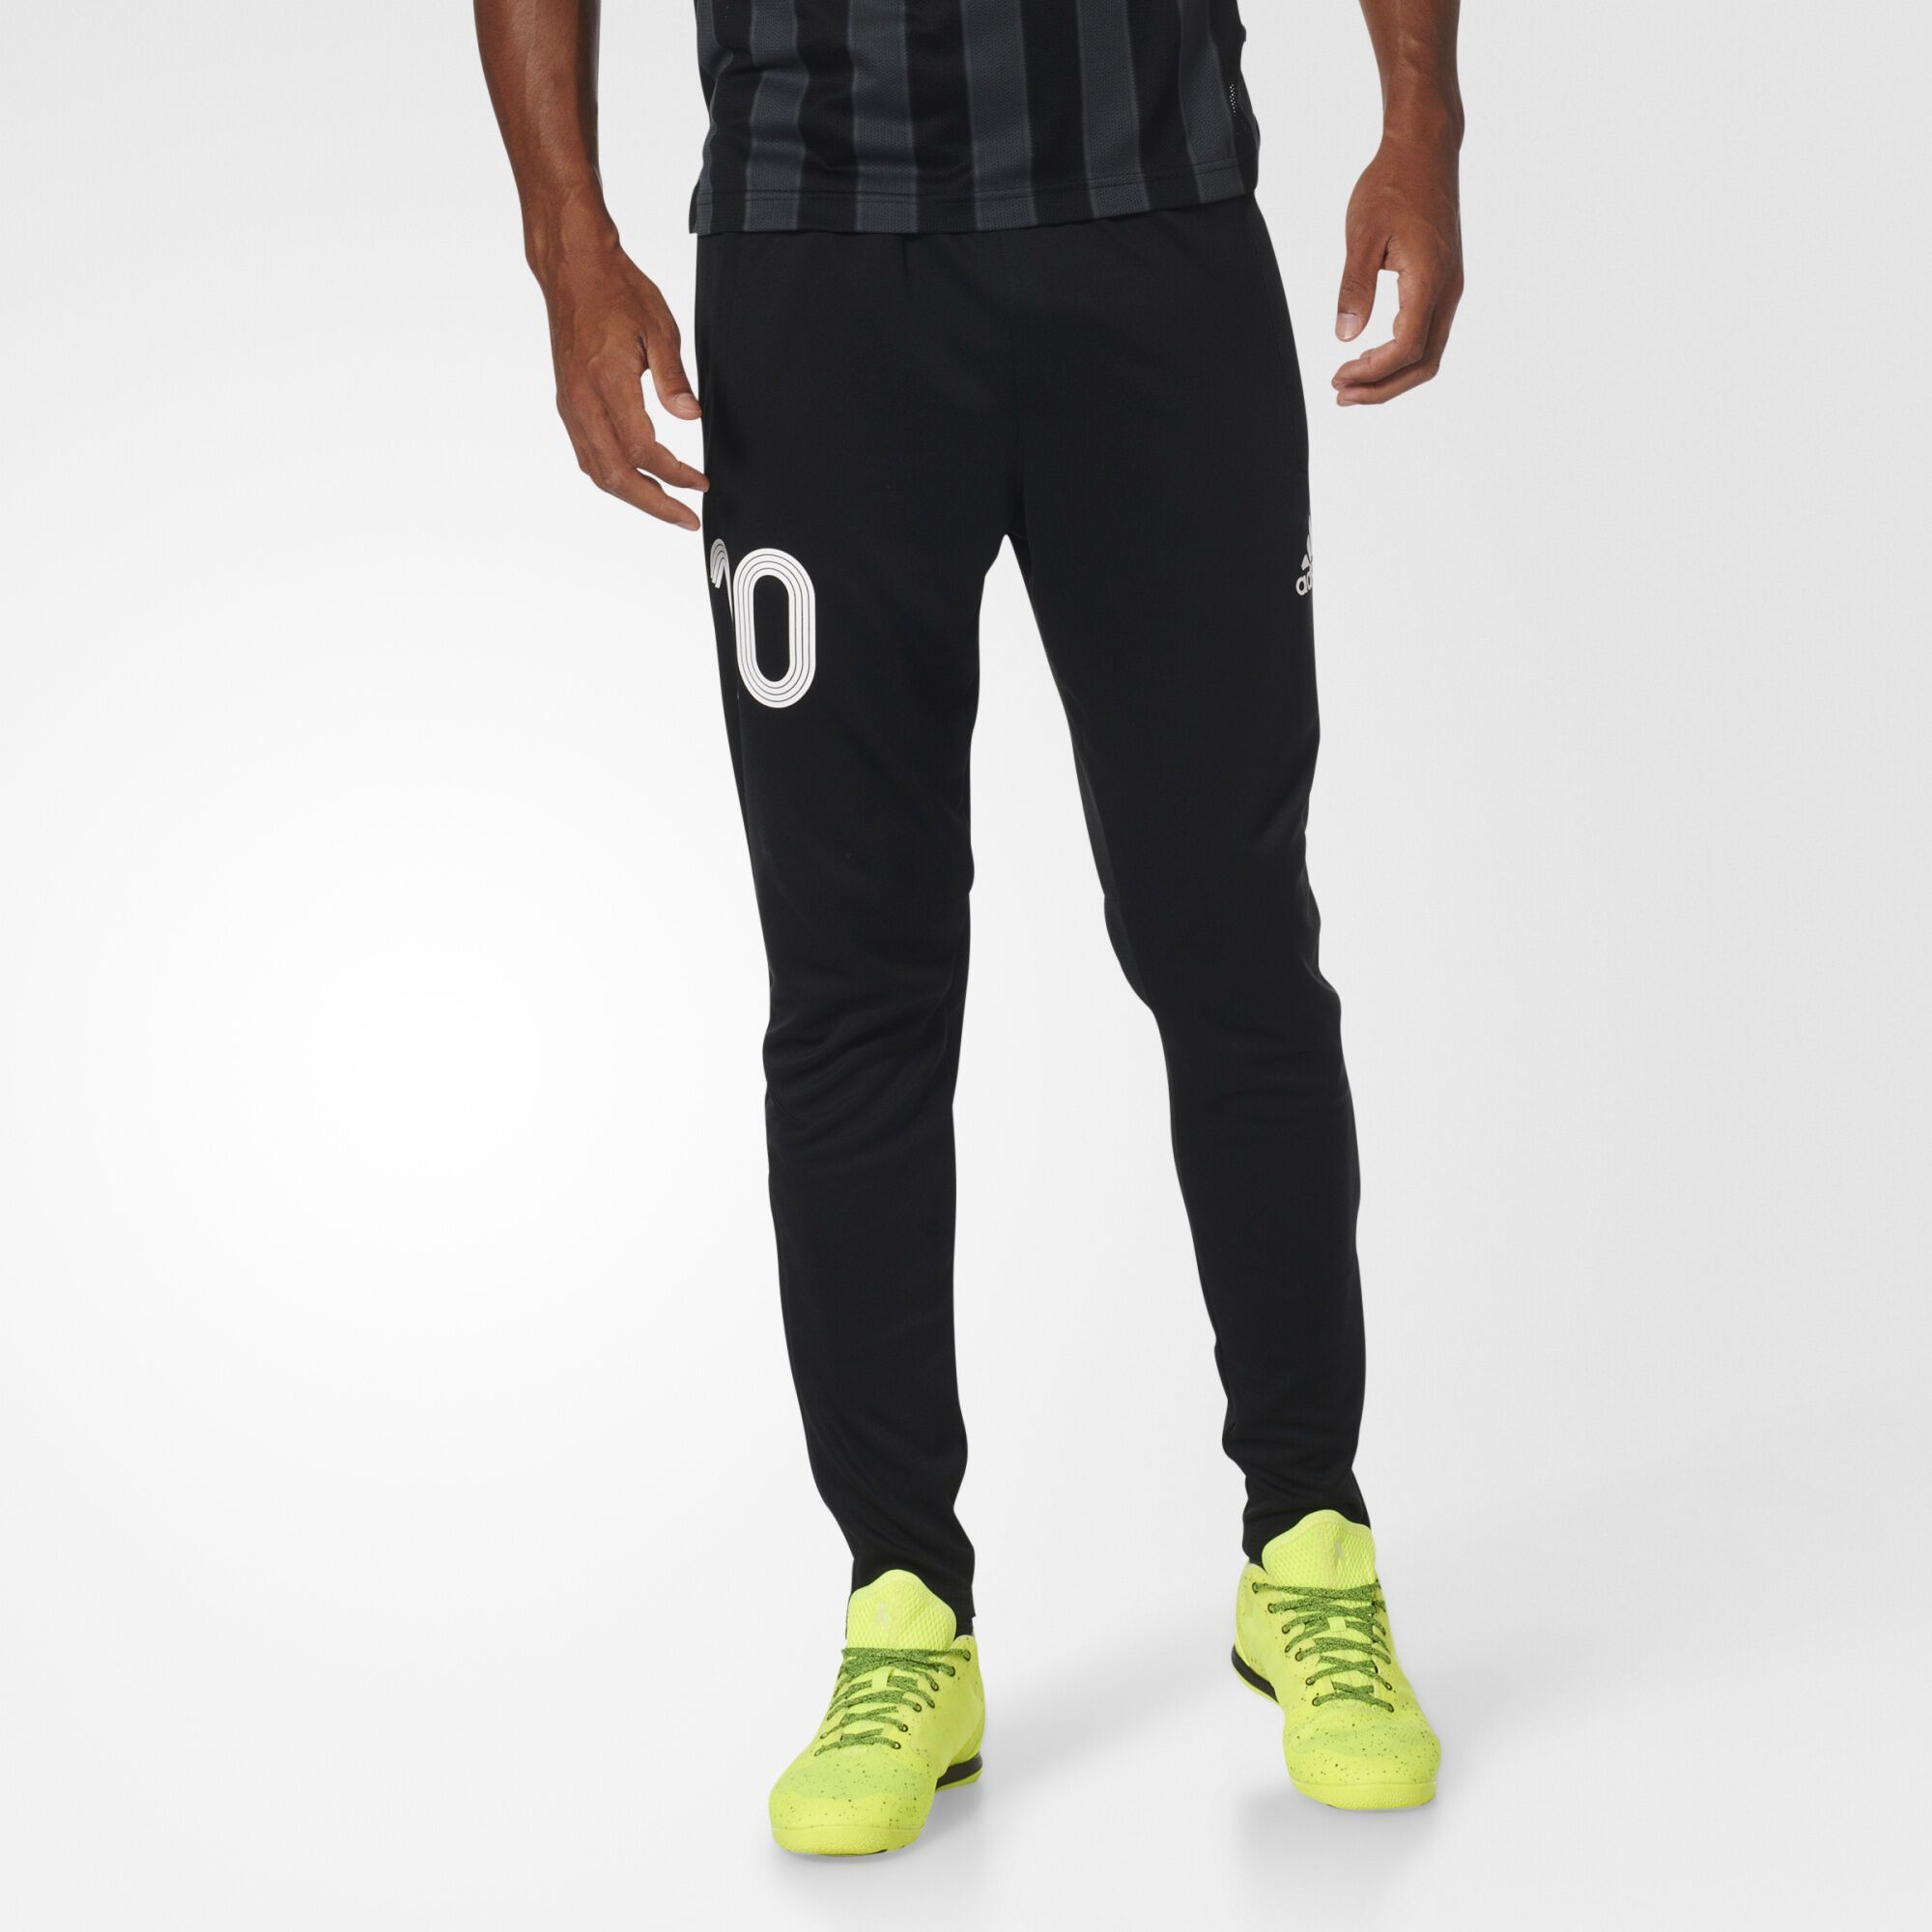 adidas skinny track pants men